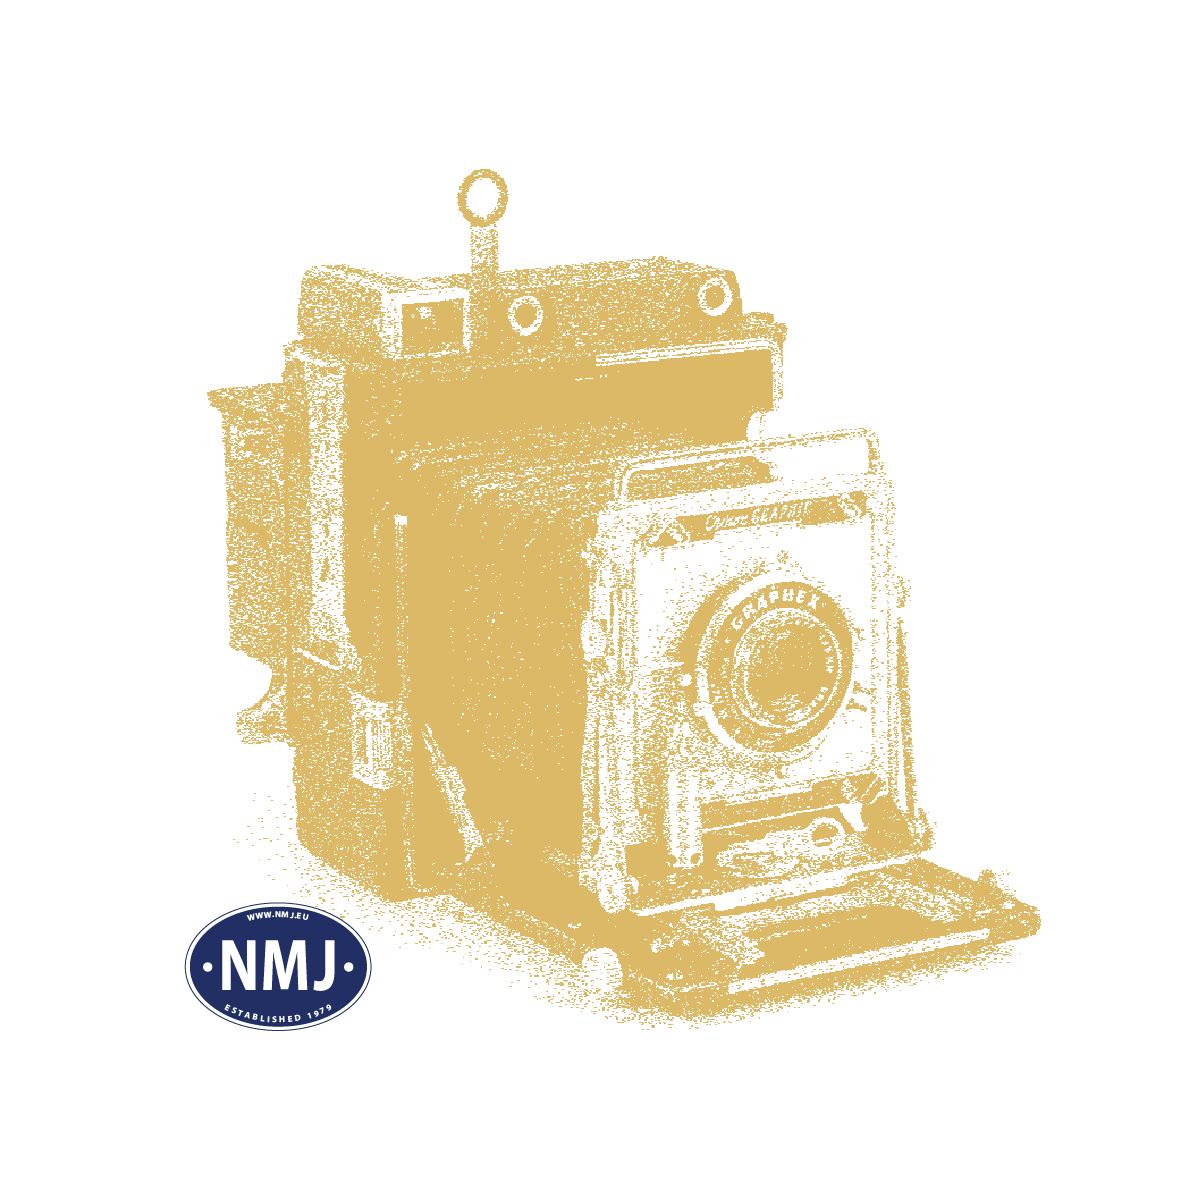 NMJS39.168 - NMJ Superline Modell der Schlepptenderlok Type39.168 der NSB